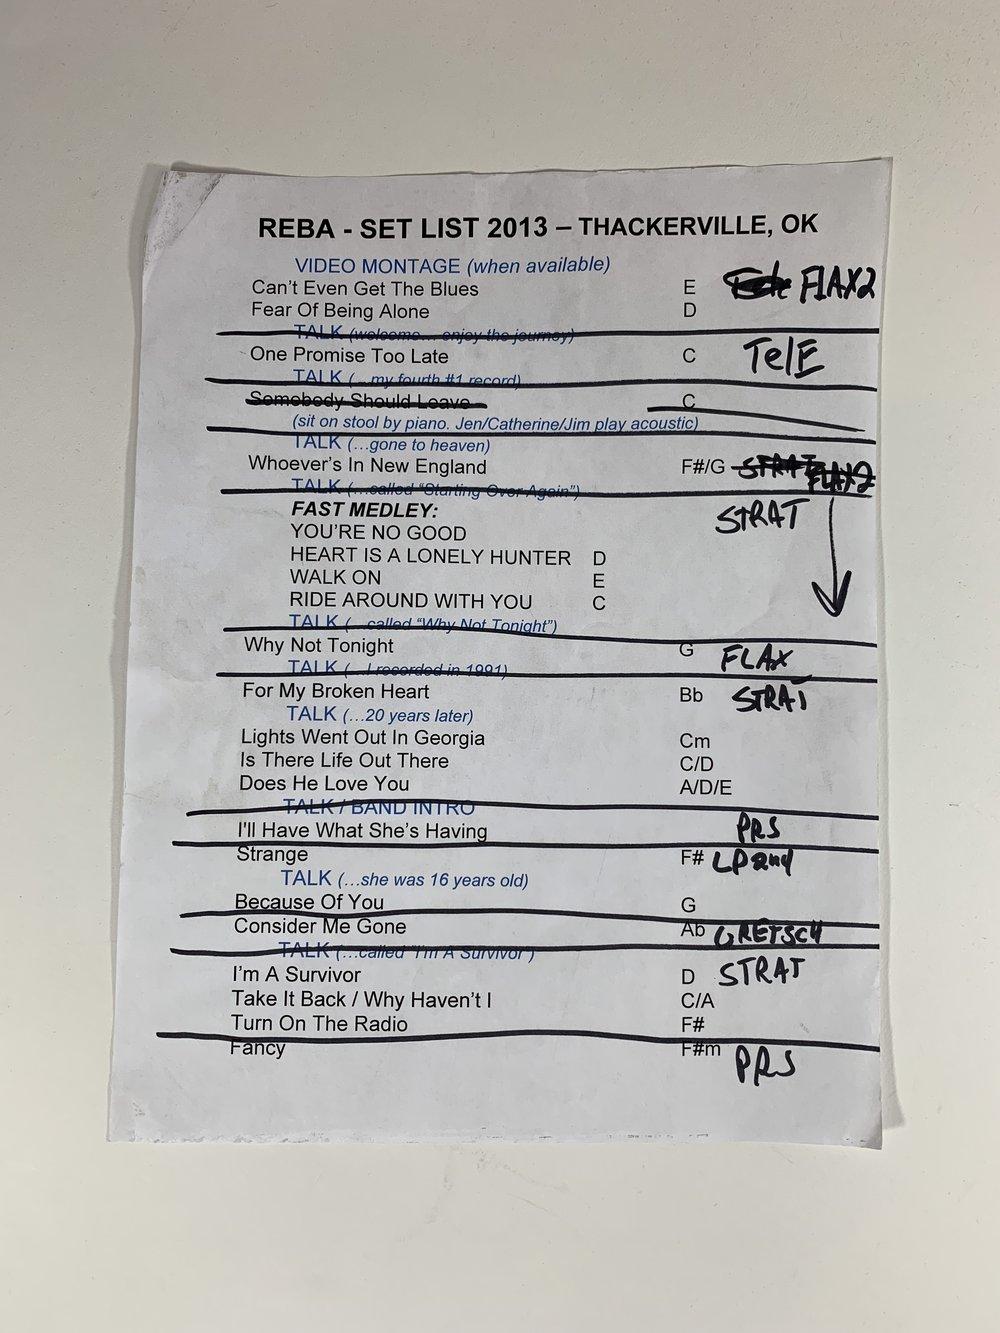 Reba McEntire | Thackerville, OK | 11/2/13